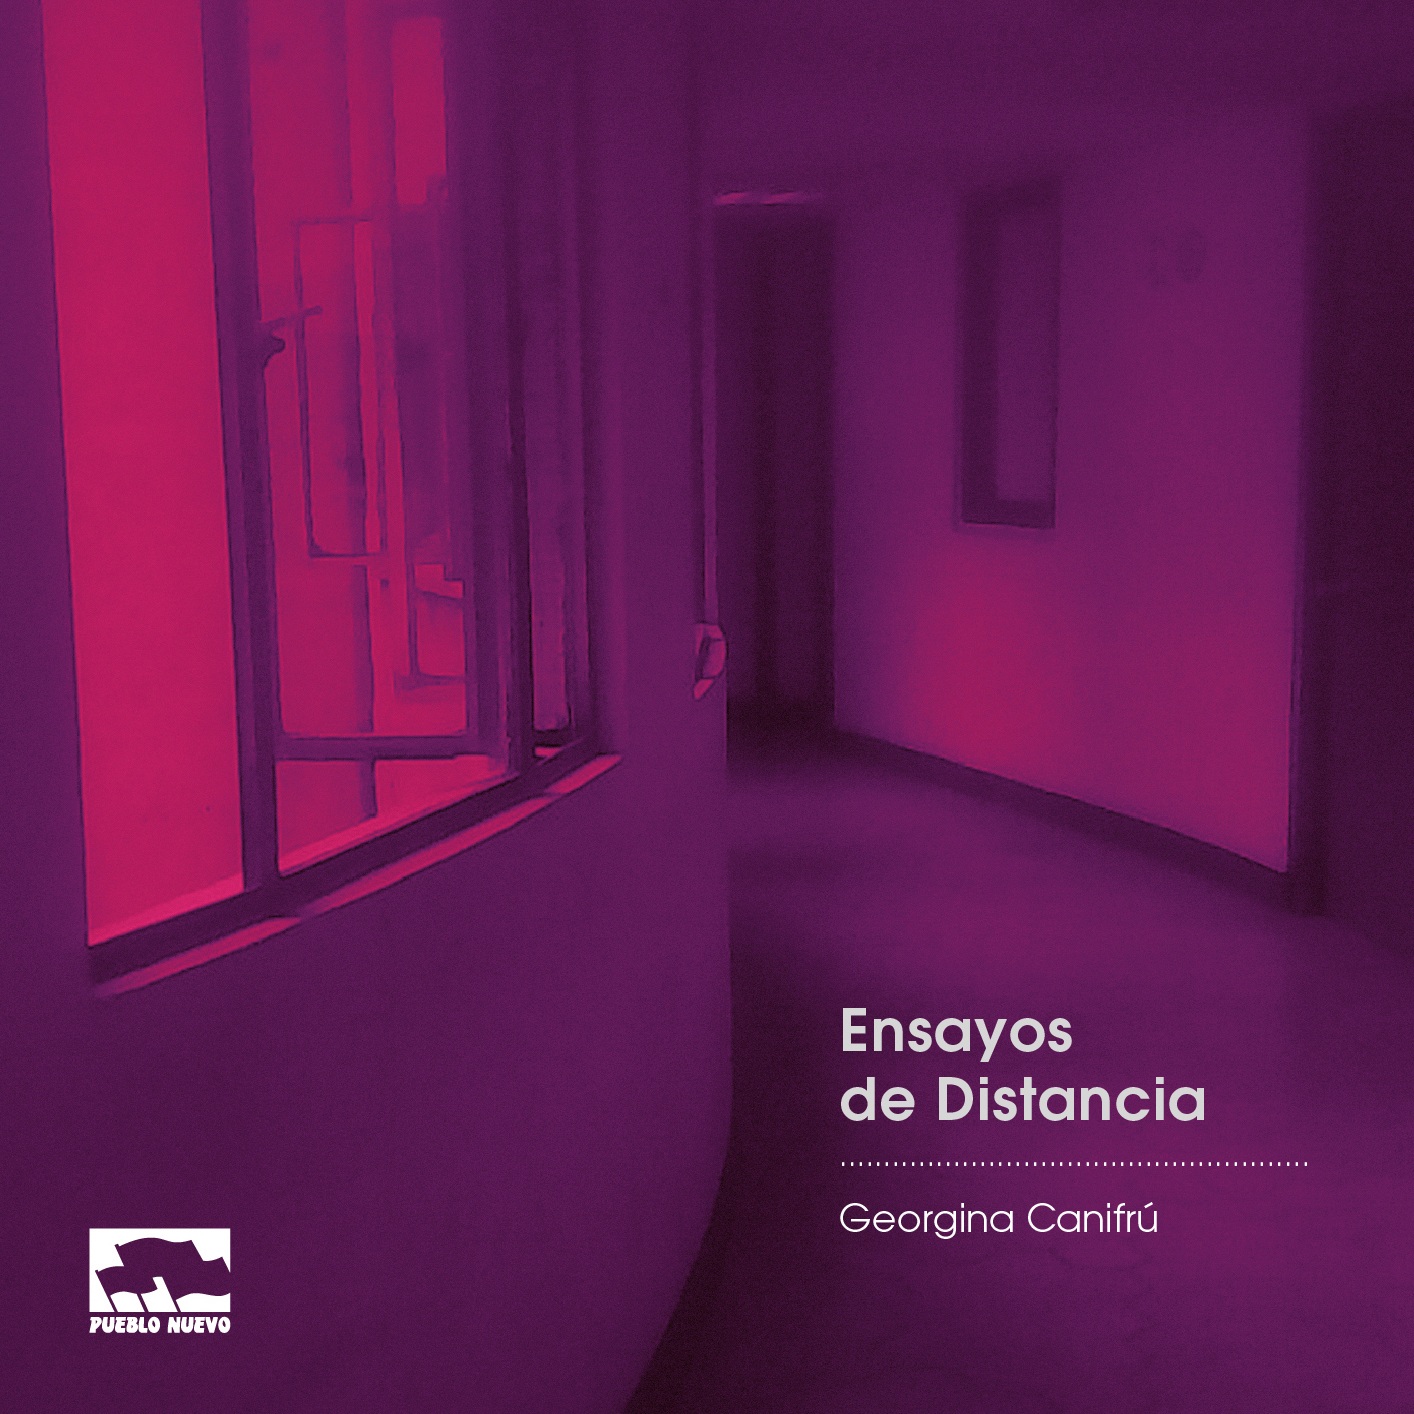 Georgina Canifrú – Ensayos de distancia